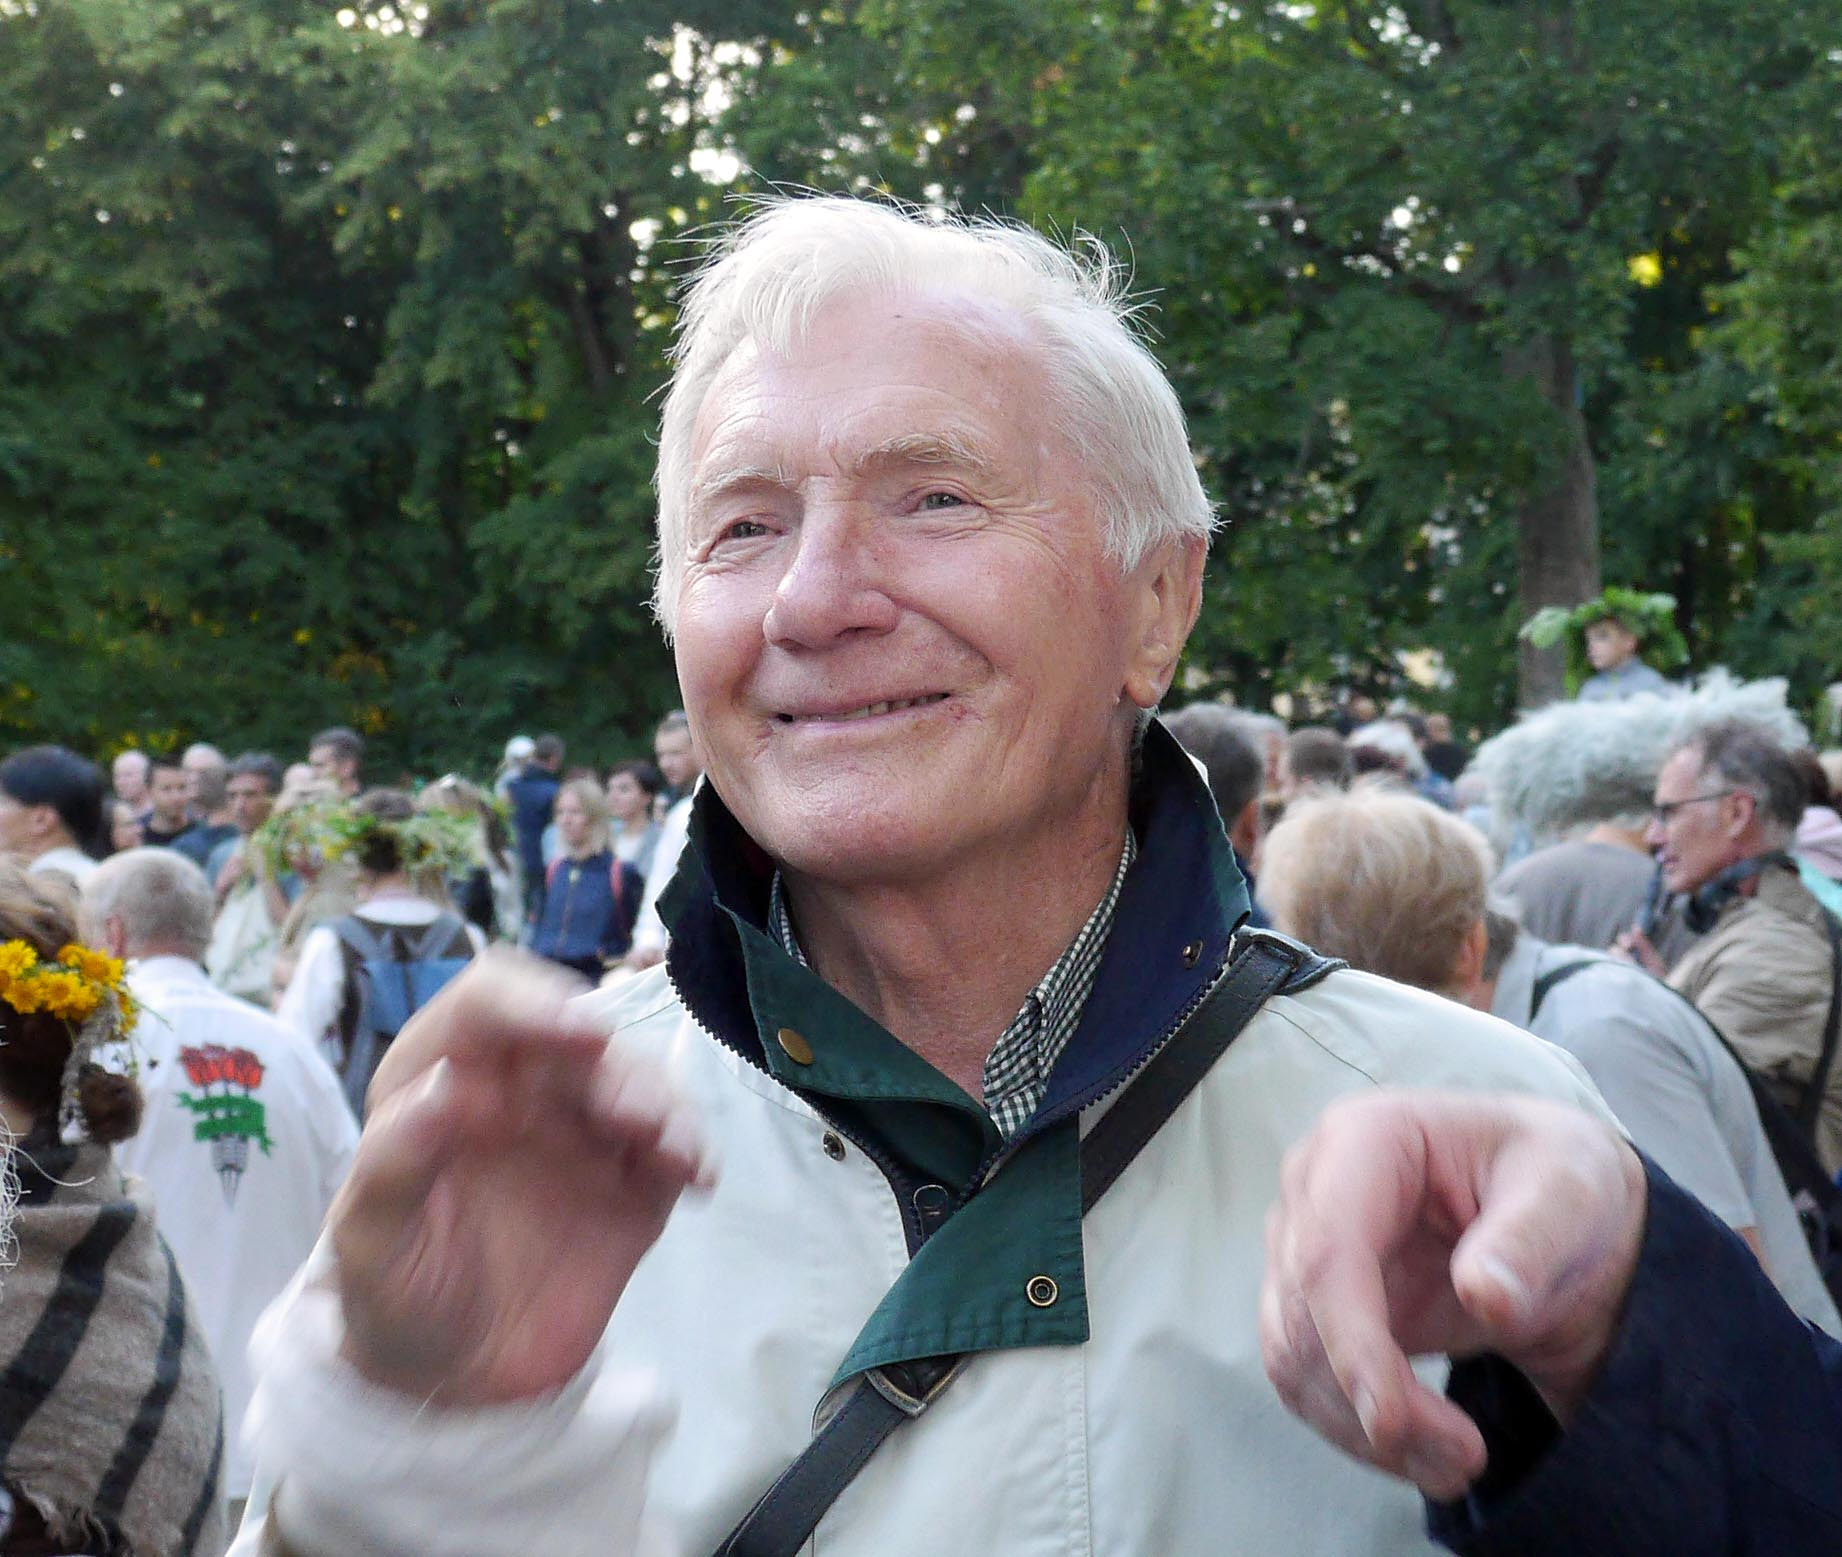 Antanas Gudelis | Alkas.lt, J. Vaiškūno nuotr.